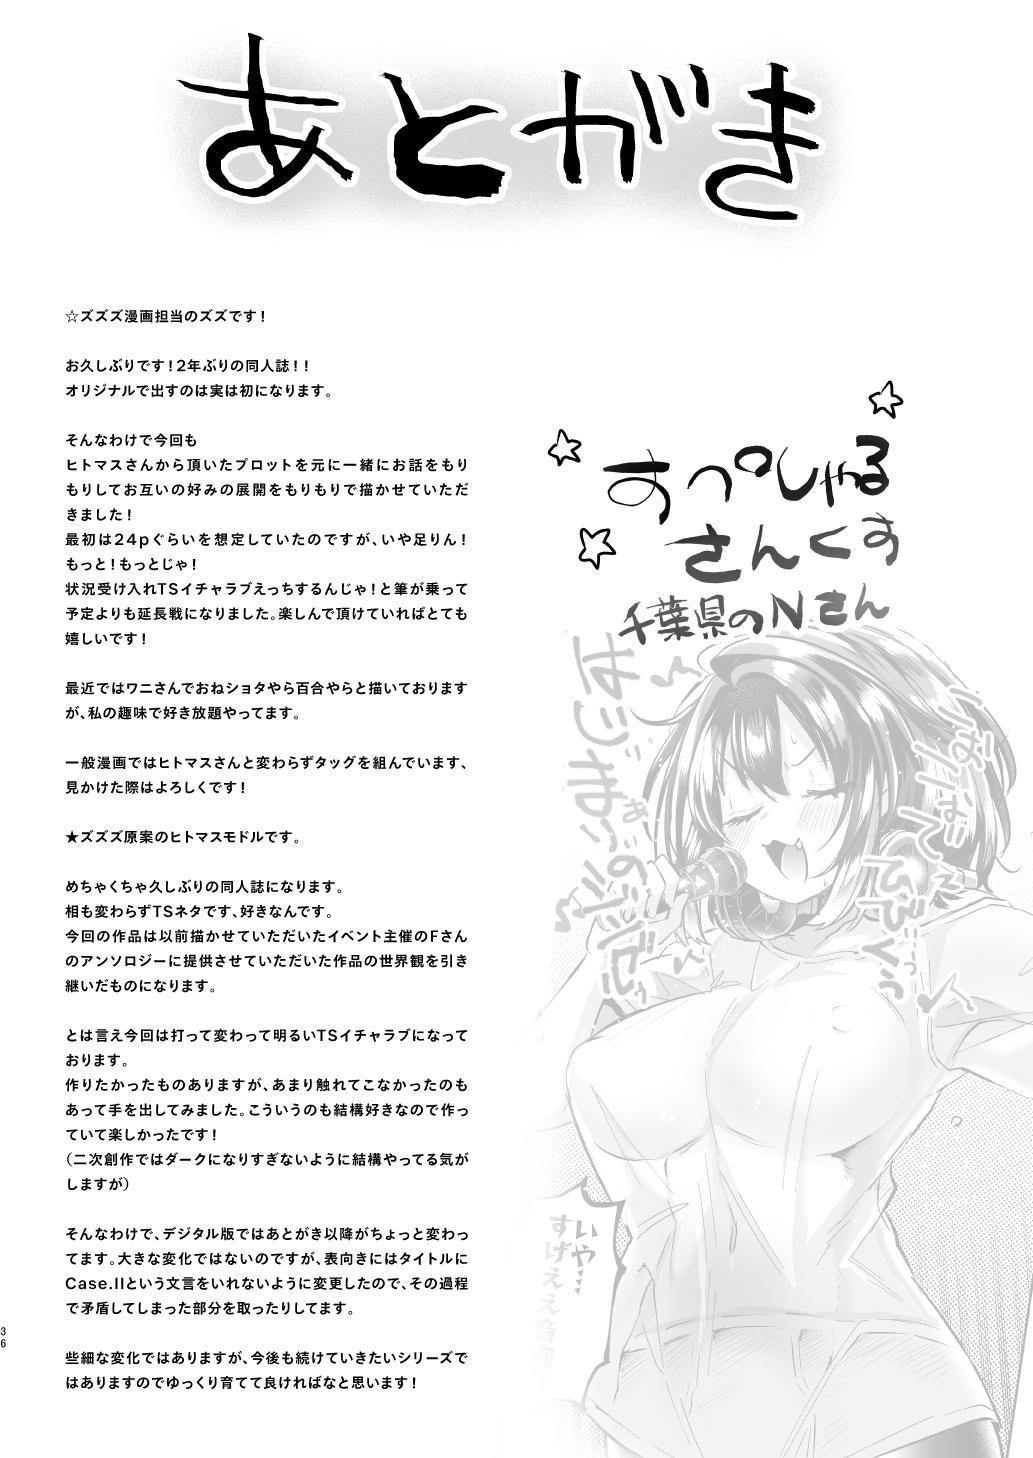 "[ZUZUZU (Kamiya Zuzu)] Utai Tekute ~Trans Conversion ""Daigakusei A no Baai""~ | I Wanted to Sing ~ Trans Conversion ""The Case of College Student A""~ [English] [WisdomWapiti] [Digital] 35"